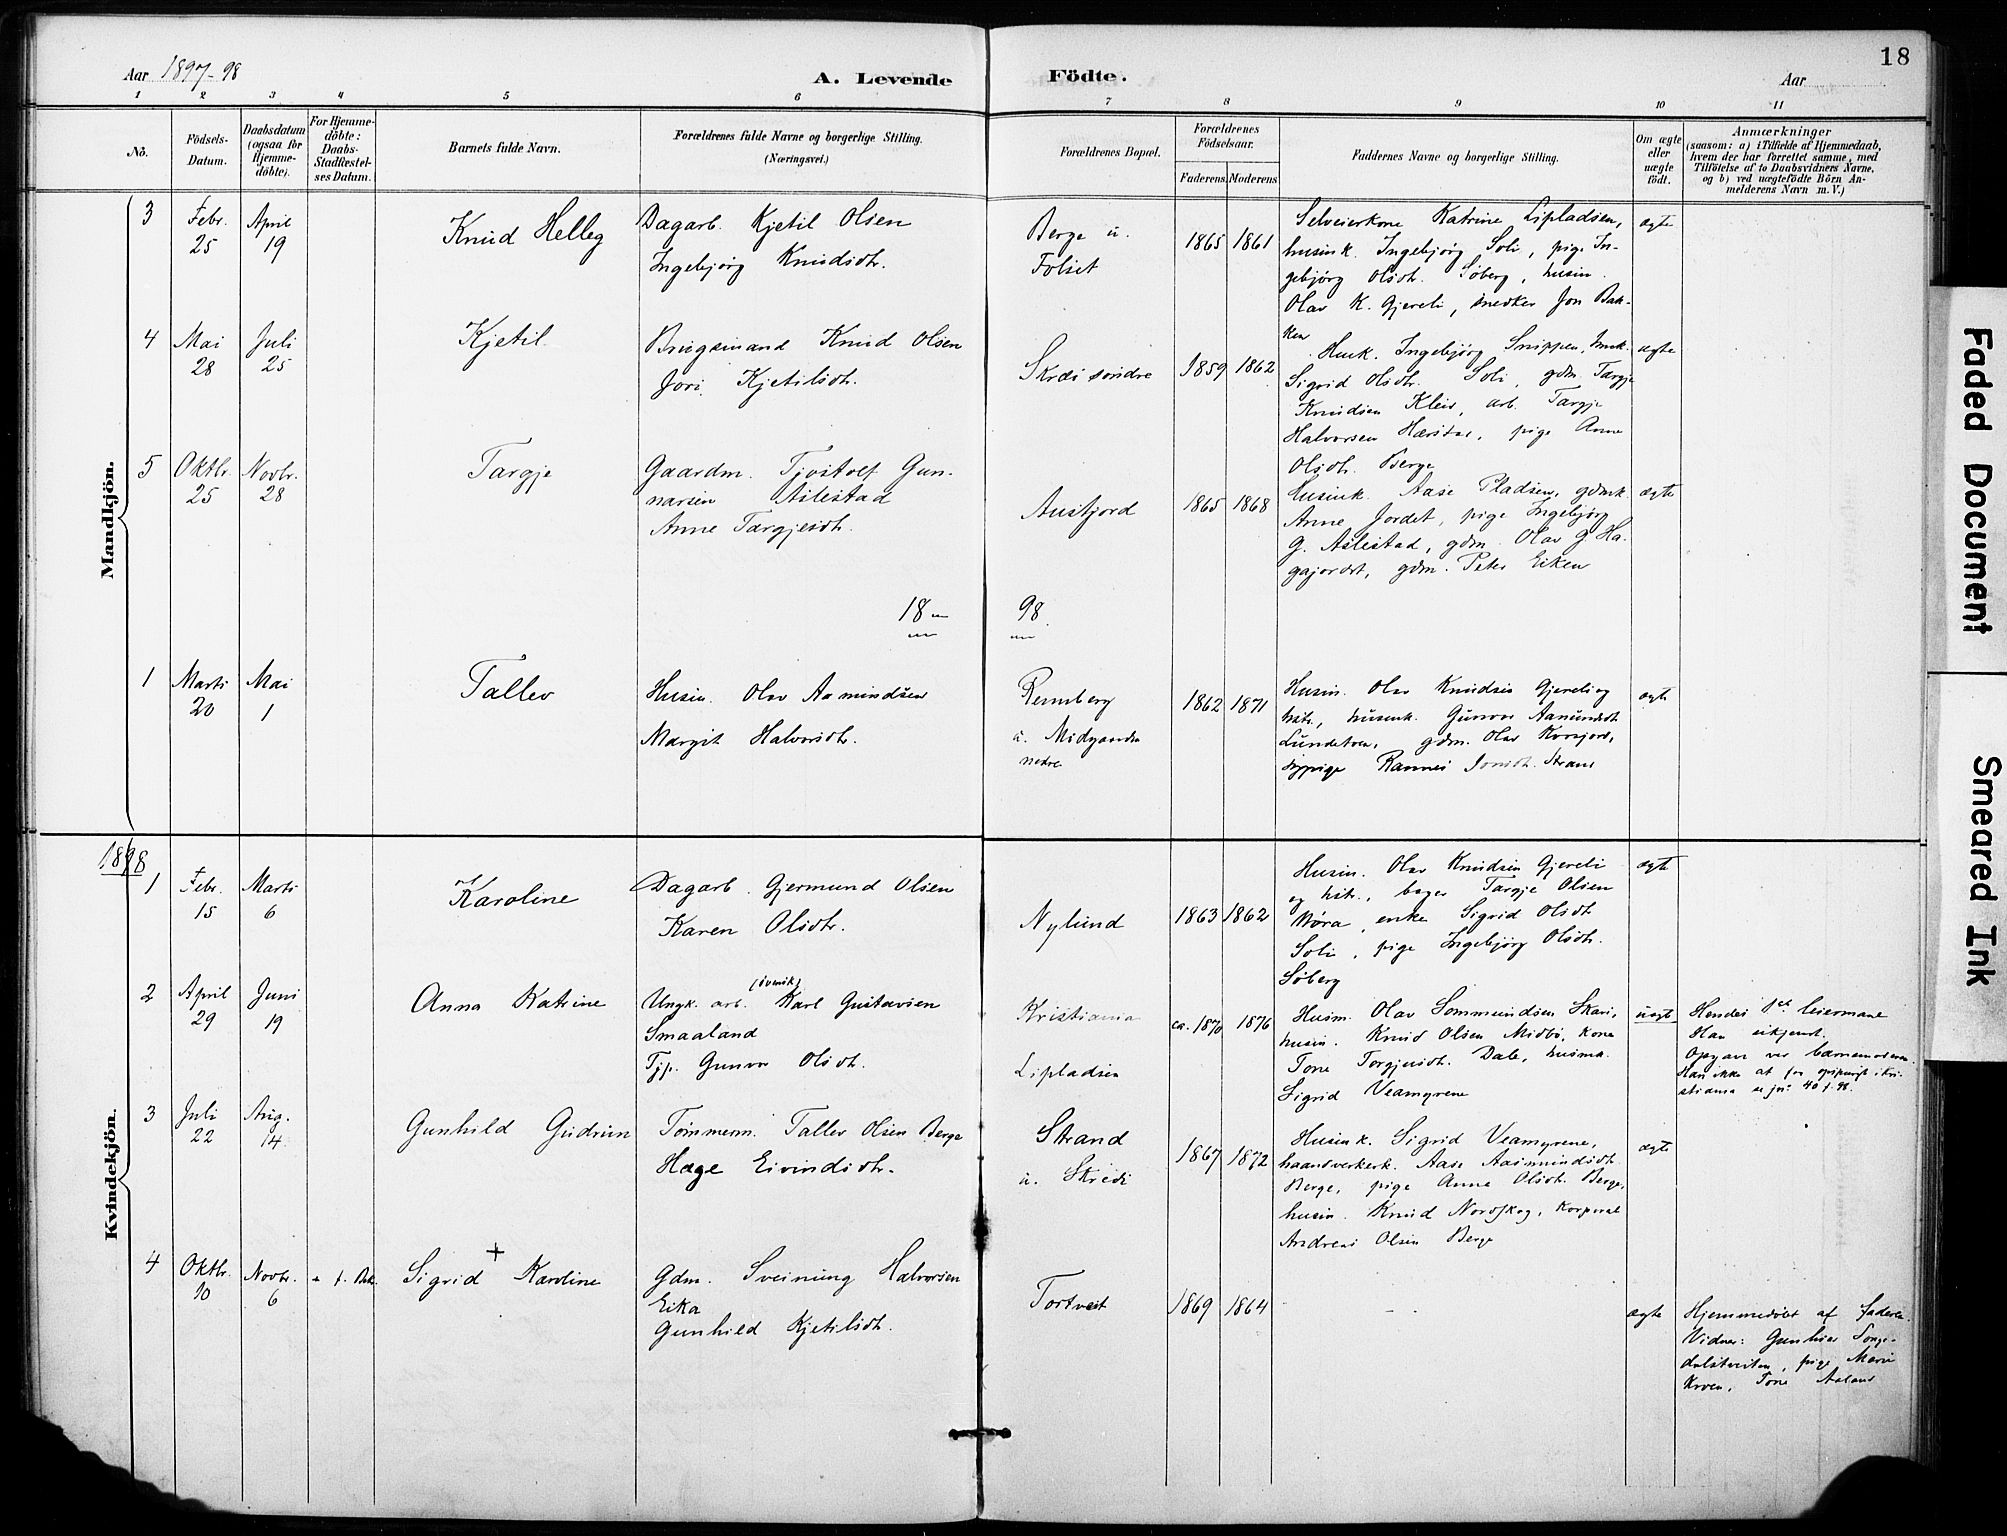 SAKO, Fyresdal kirkebøker, F/Fb/L0003: Ministerialbok nr. II 3, 1887-1903, s. 18